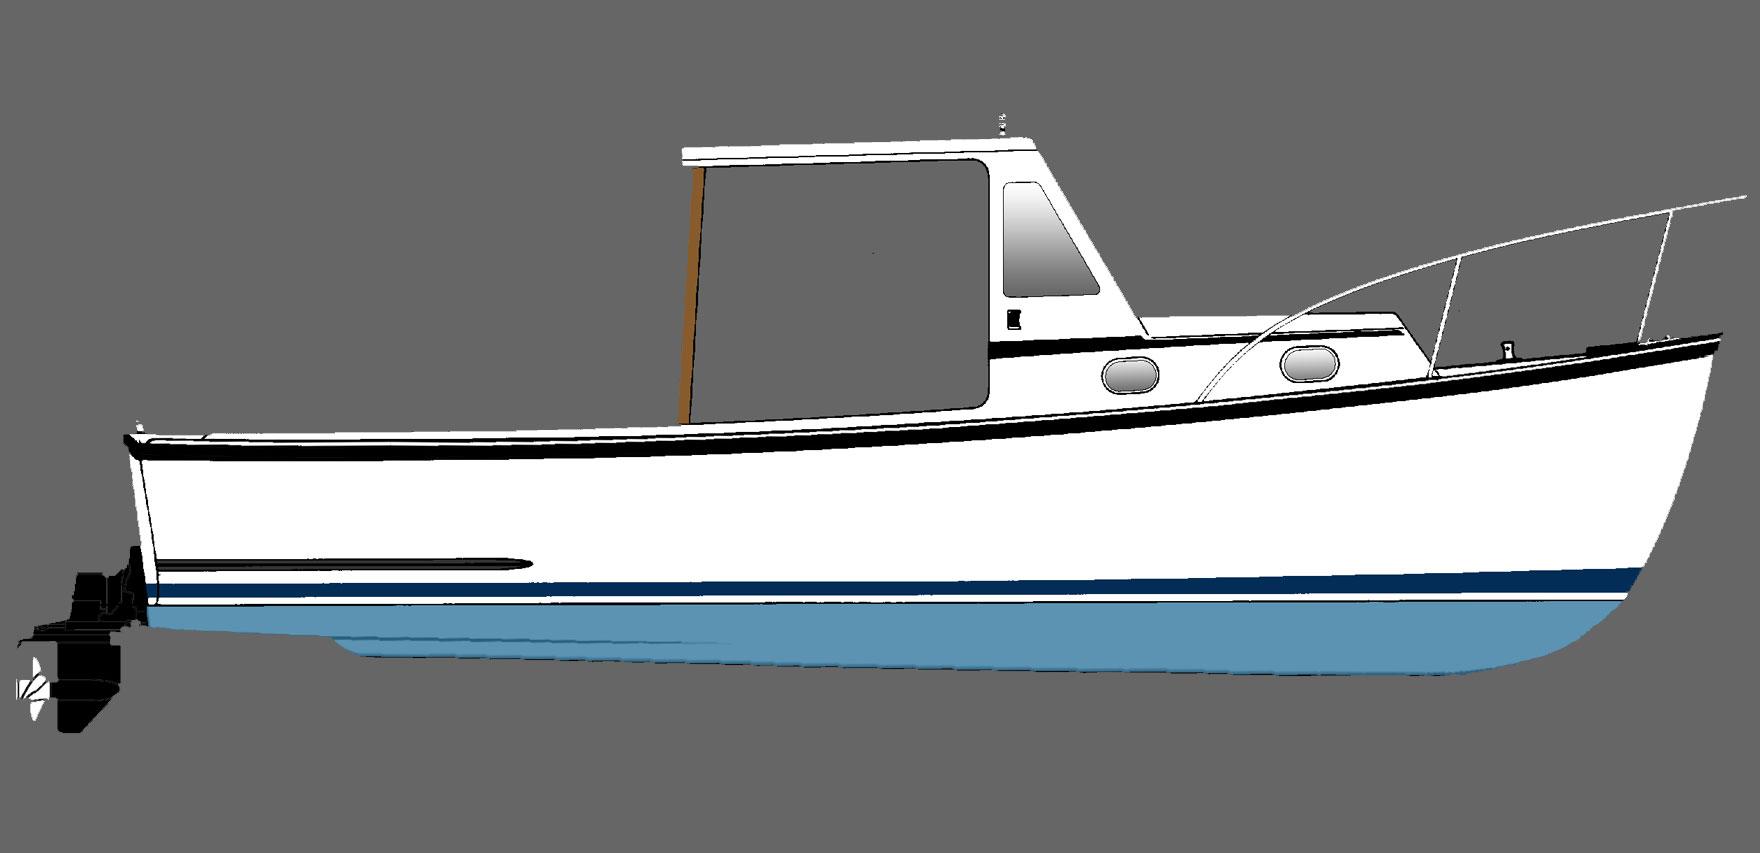 Ellis Boat For Sale: Ellis 24 Lobsteryacht ('93)